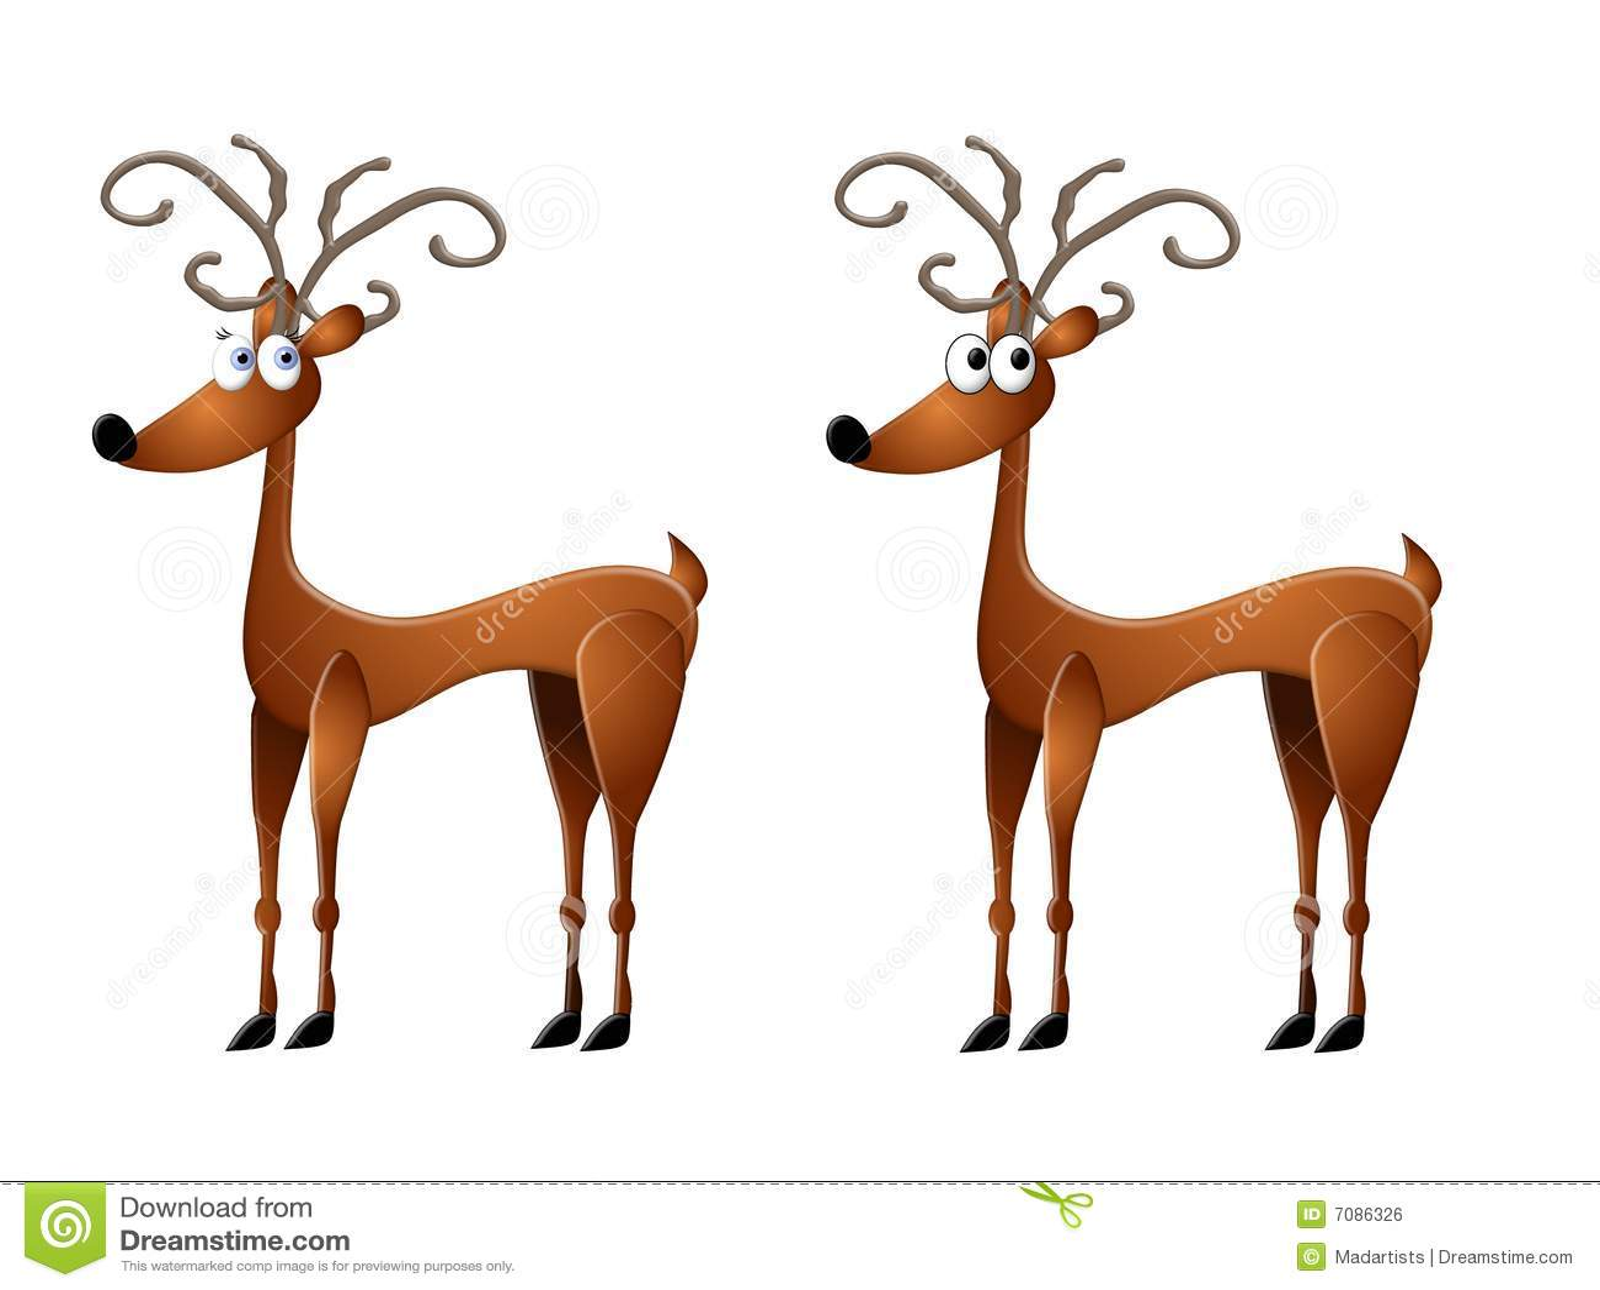 Cartoon Reindeer Clip Art Royalty Free Stock Image - Image: 7086326